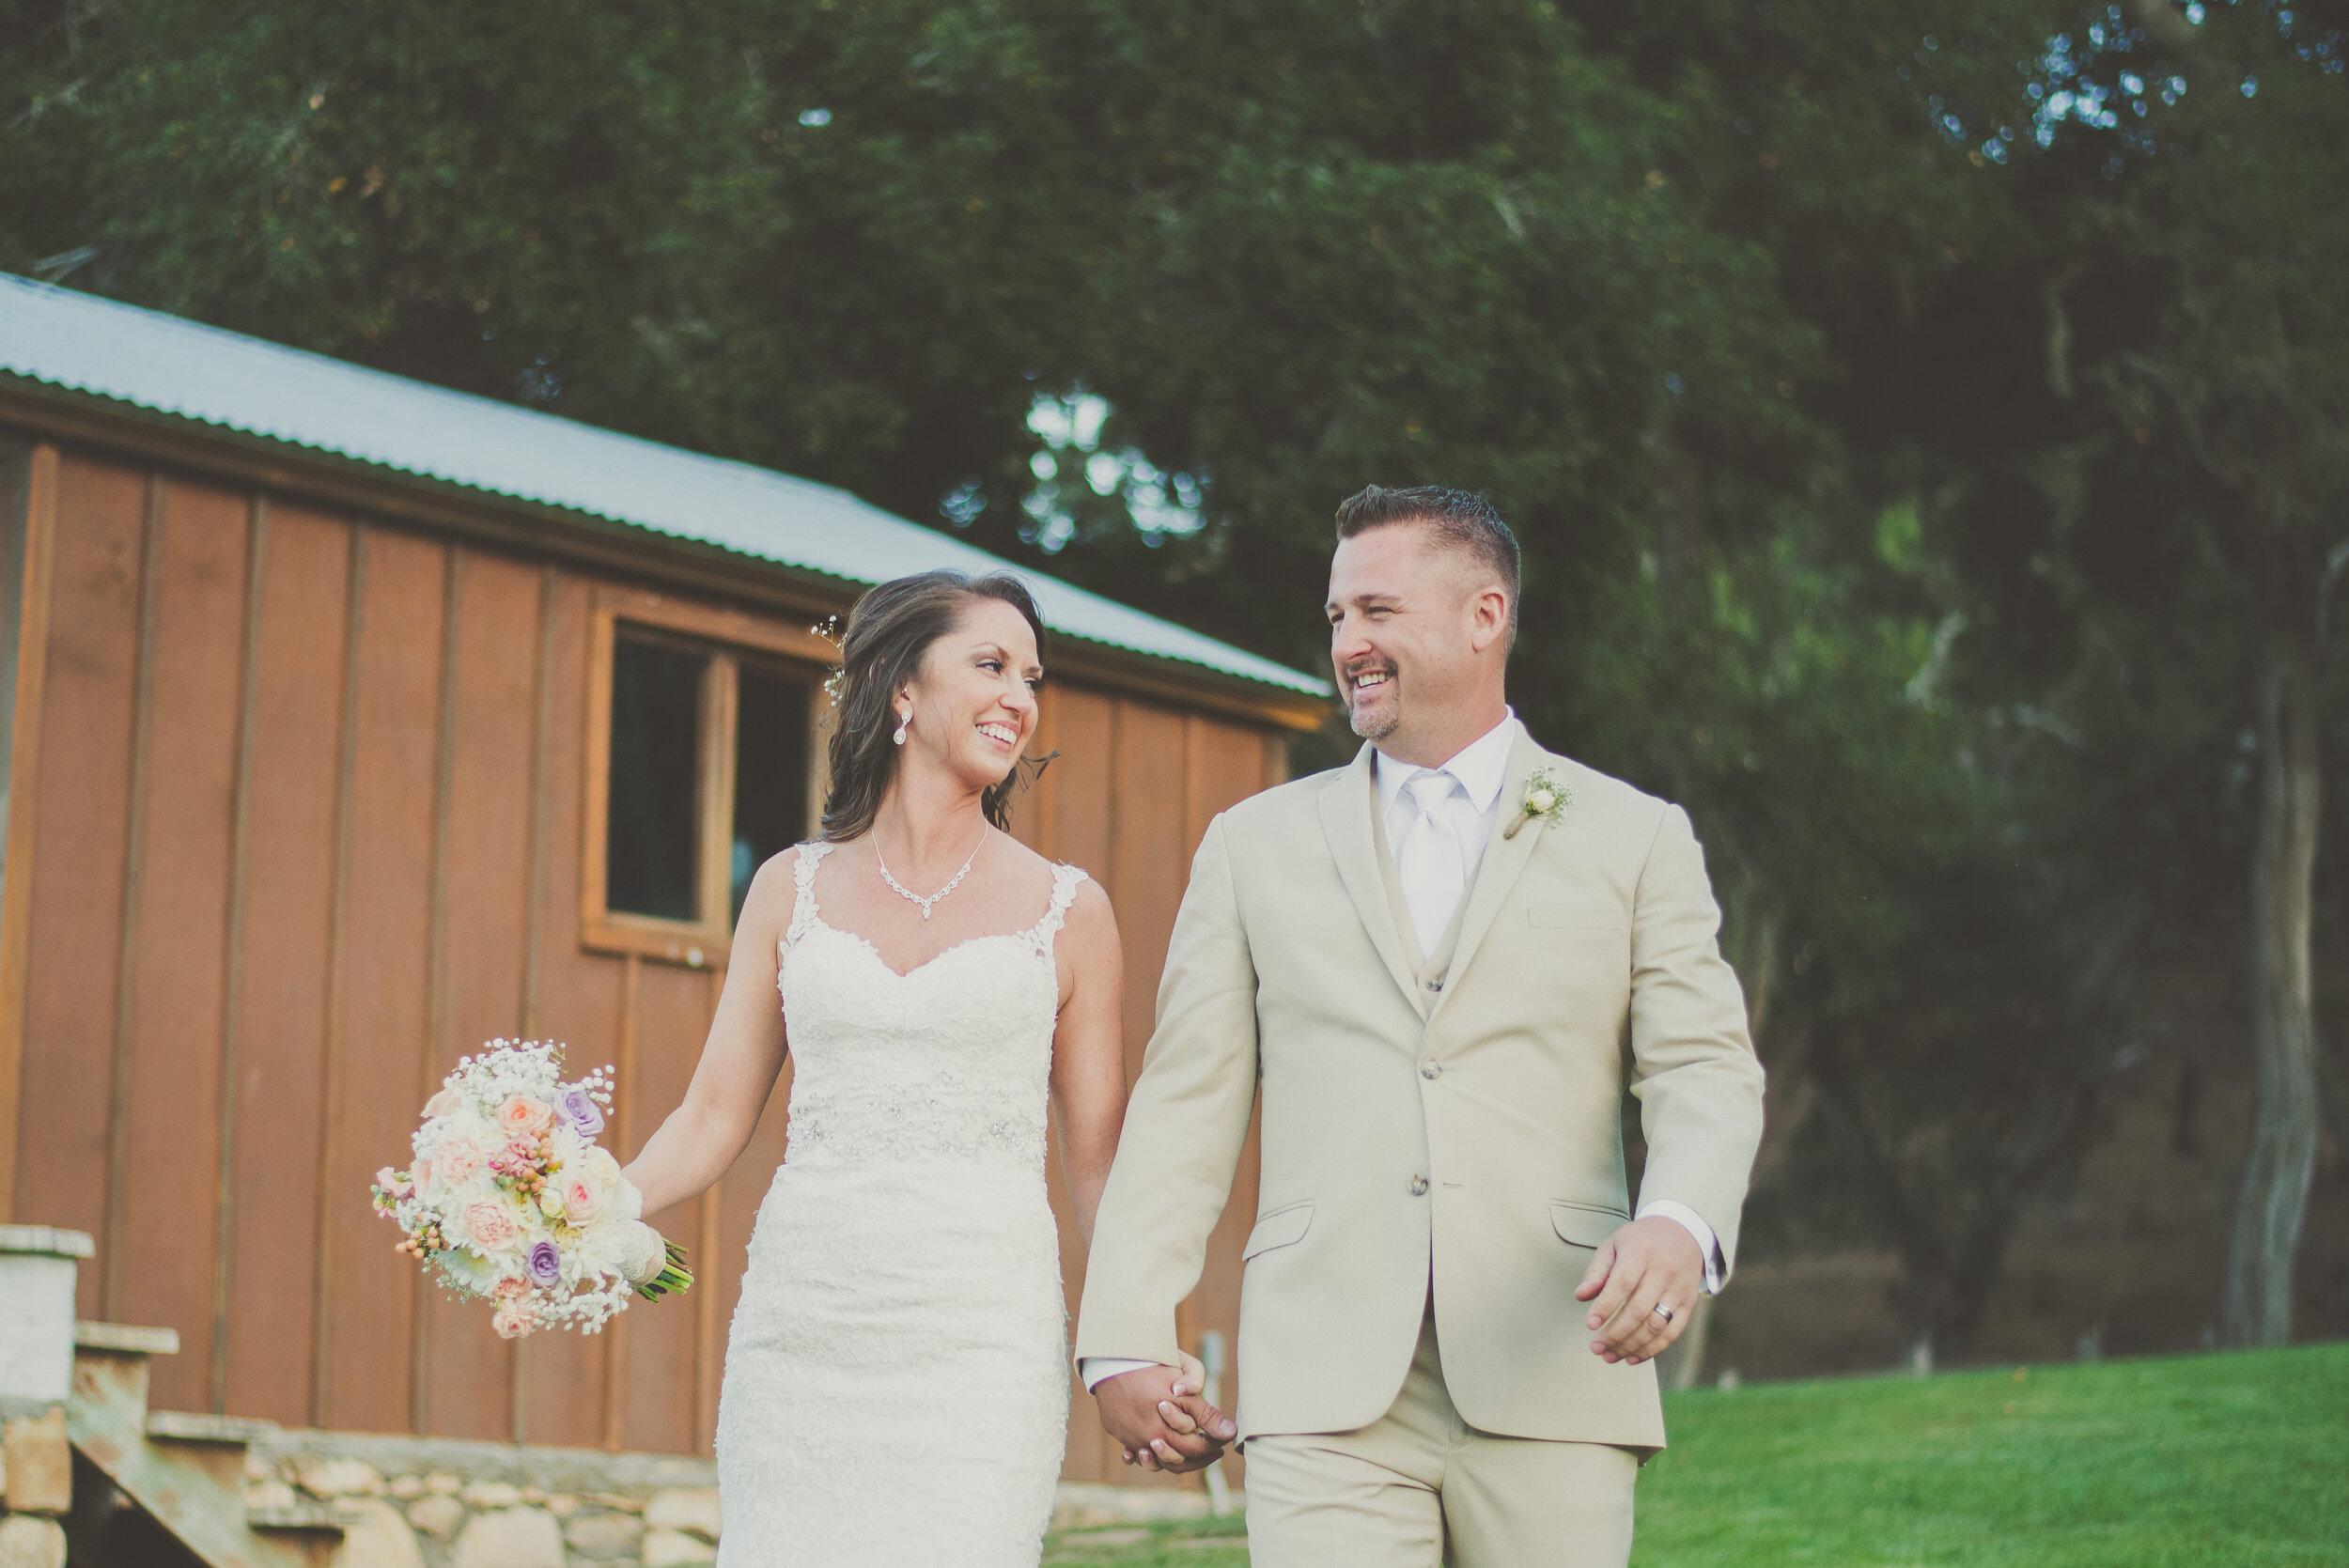 Roberts Wedding - Reception-42.jpg